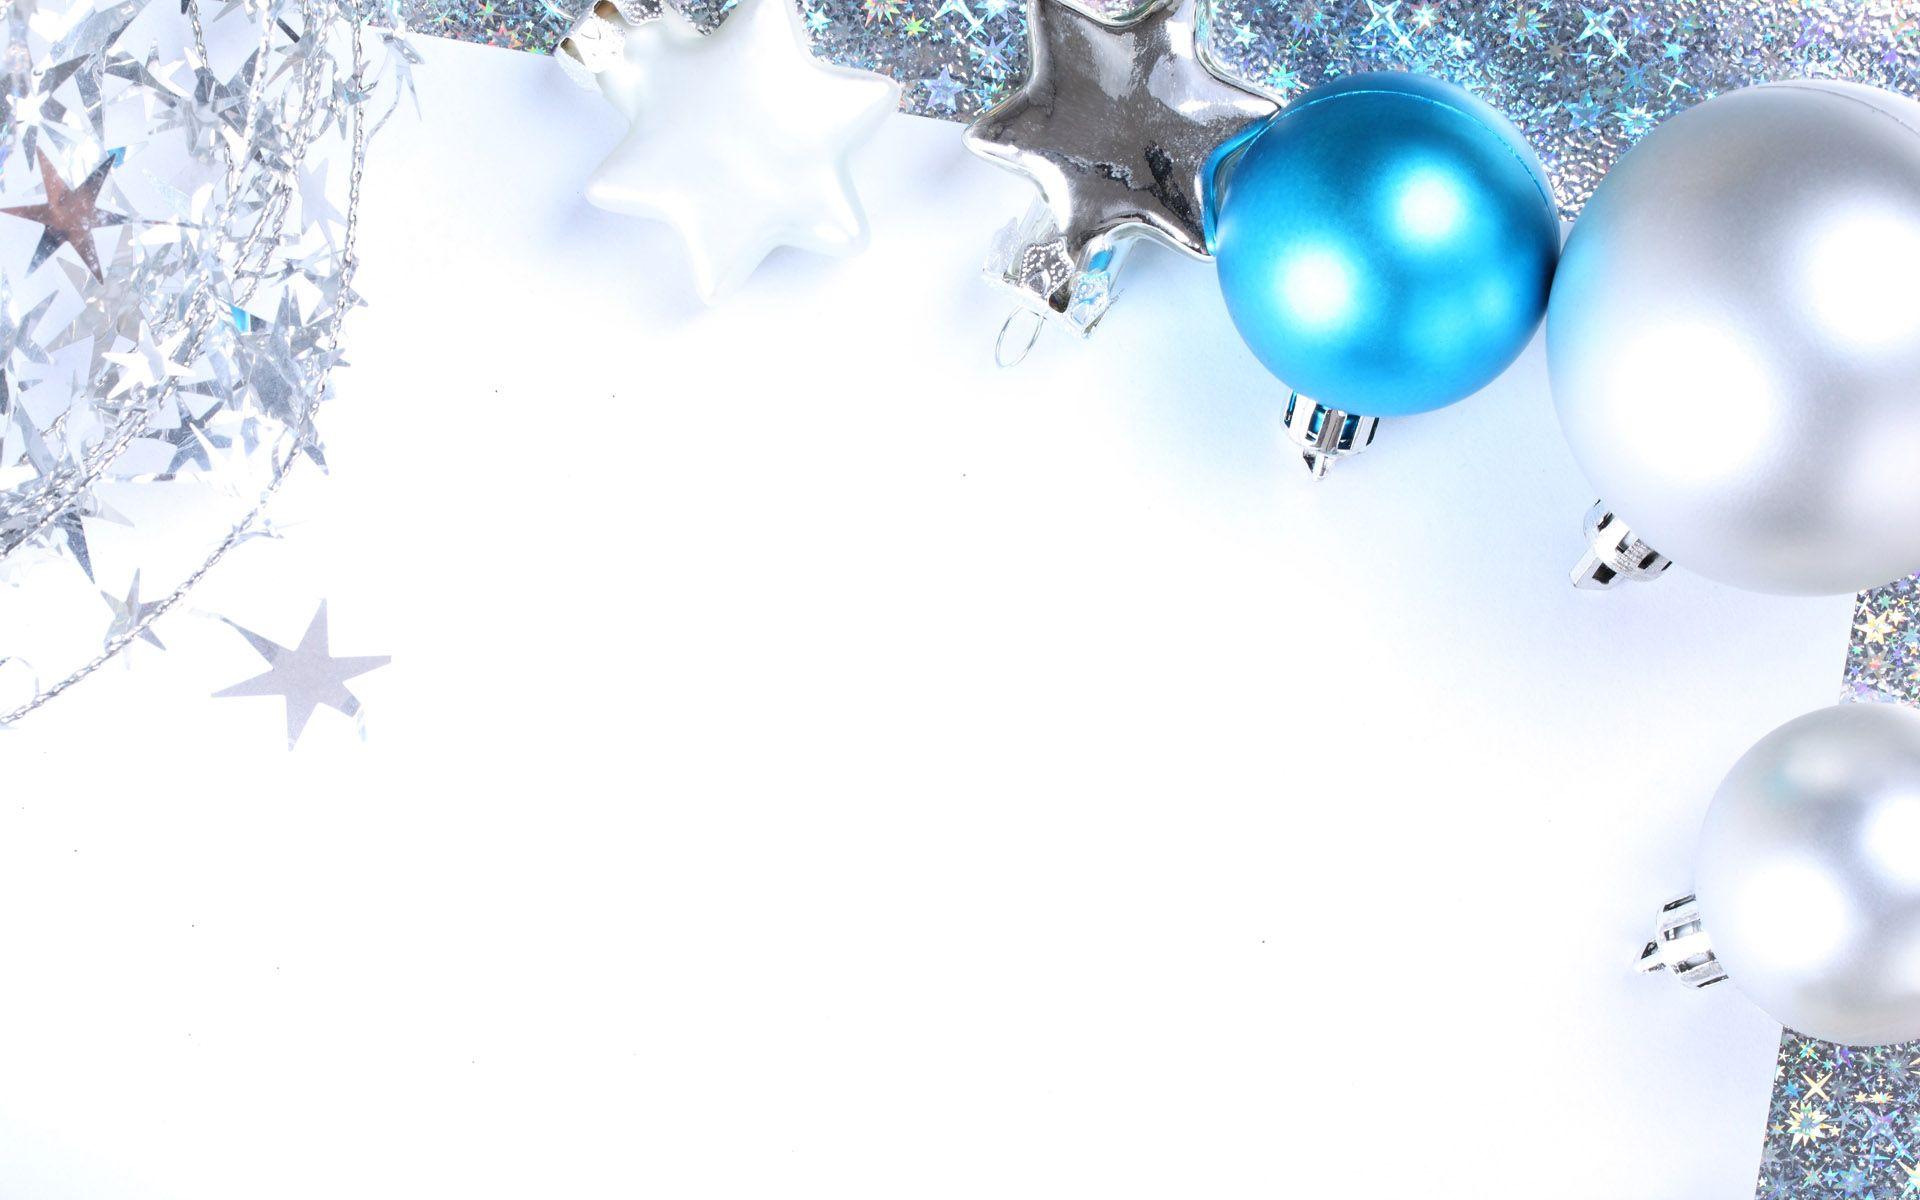 Image For Christmas Wallpaper Blue And Silver Christmas